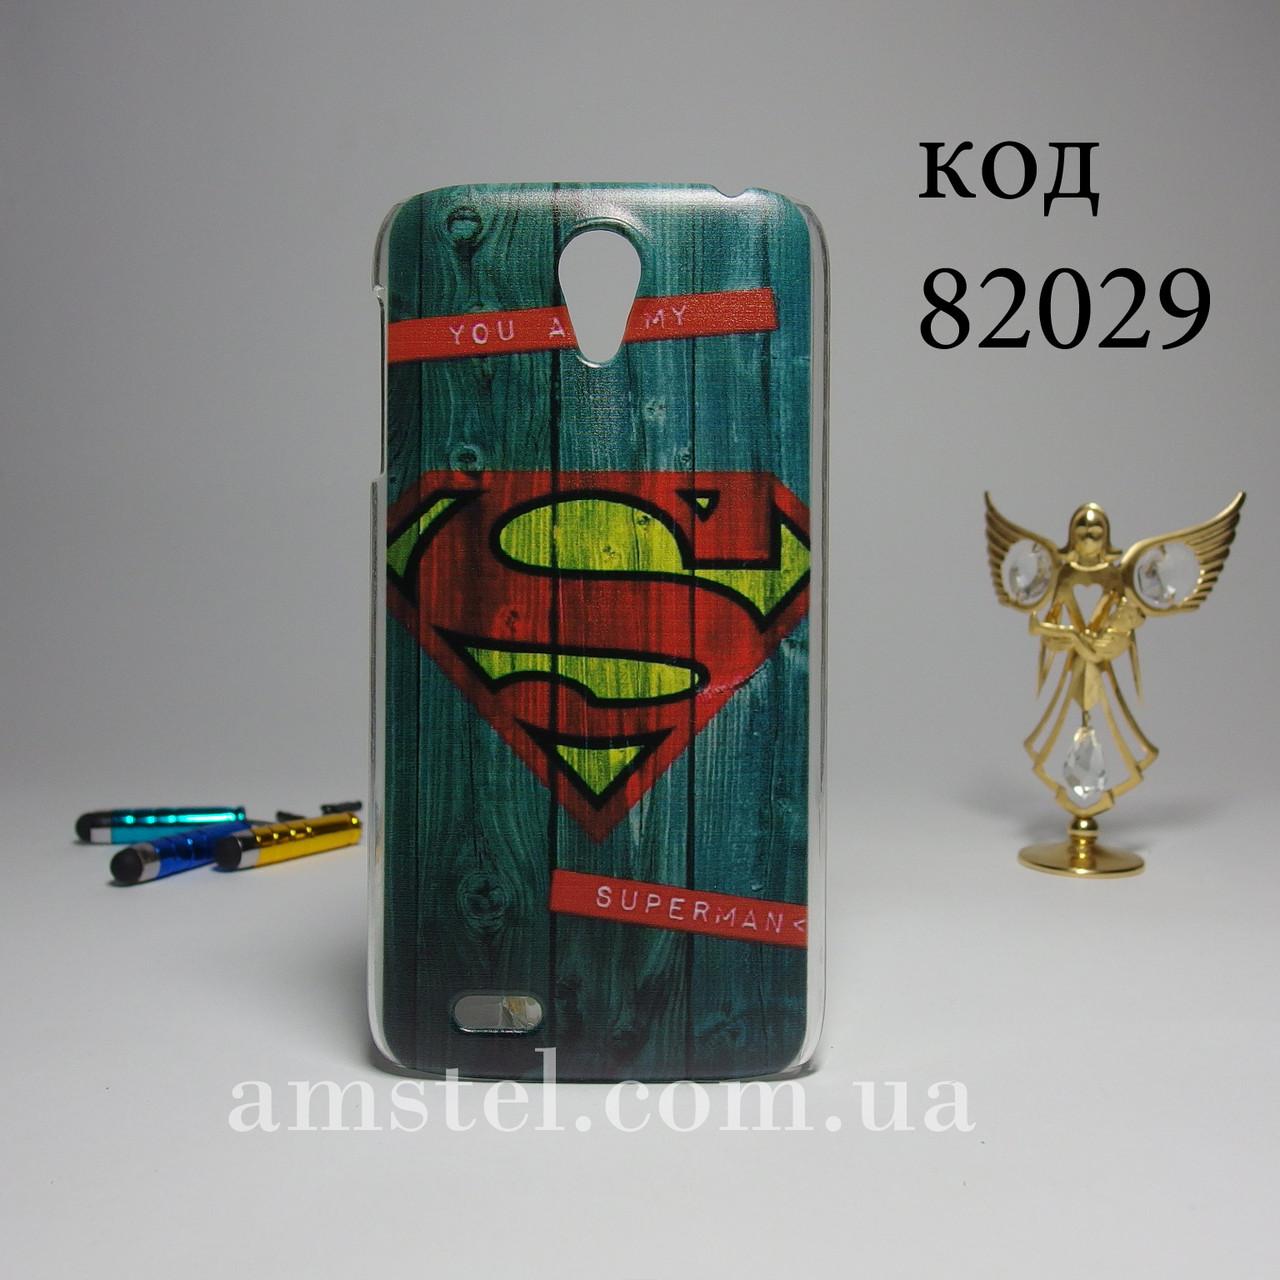 Чехол для lenovo s820 панель накладка с рисунком супермен